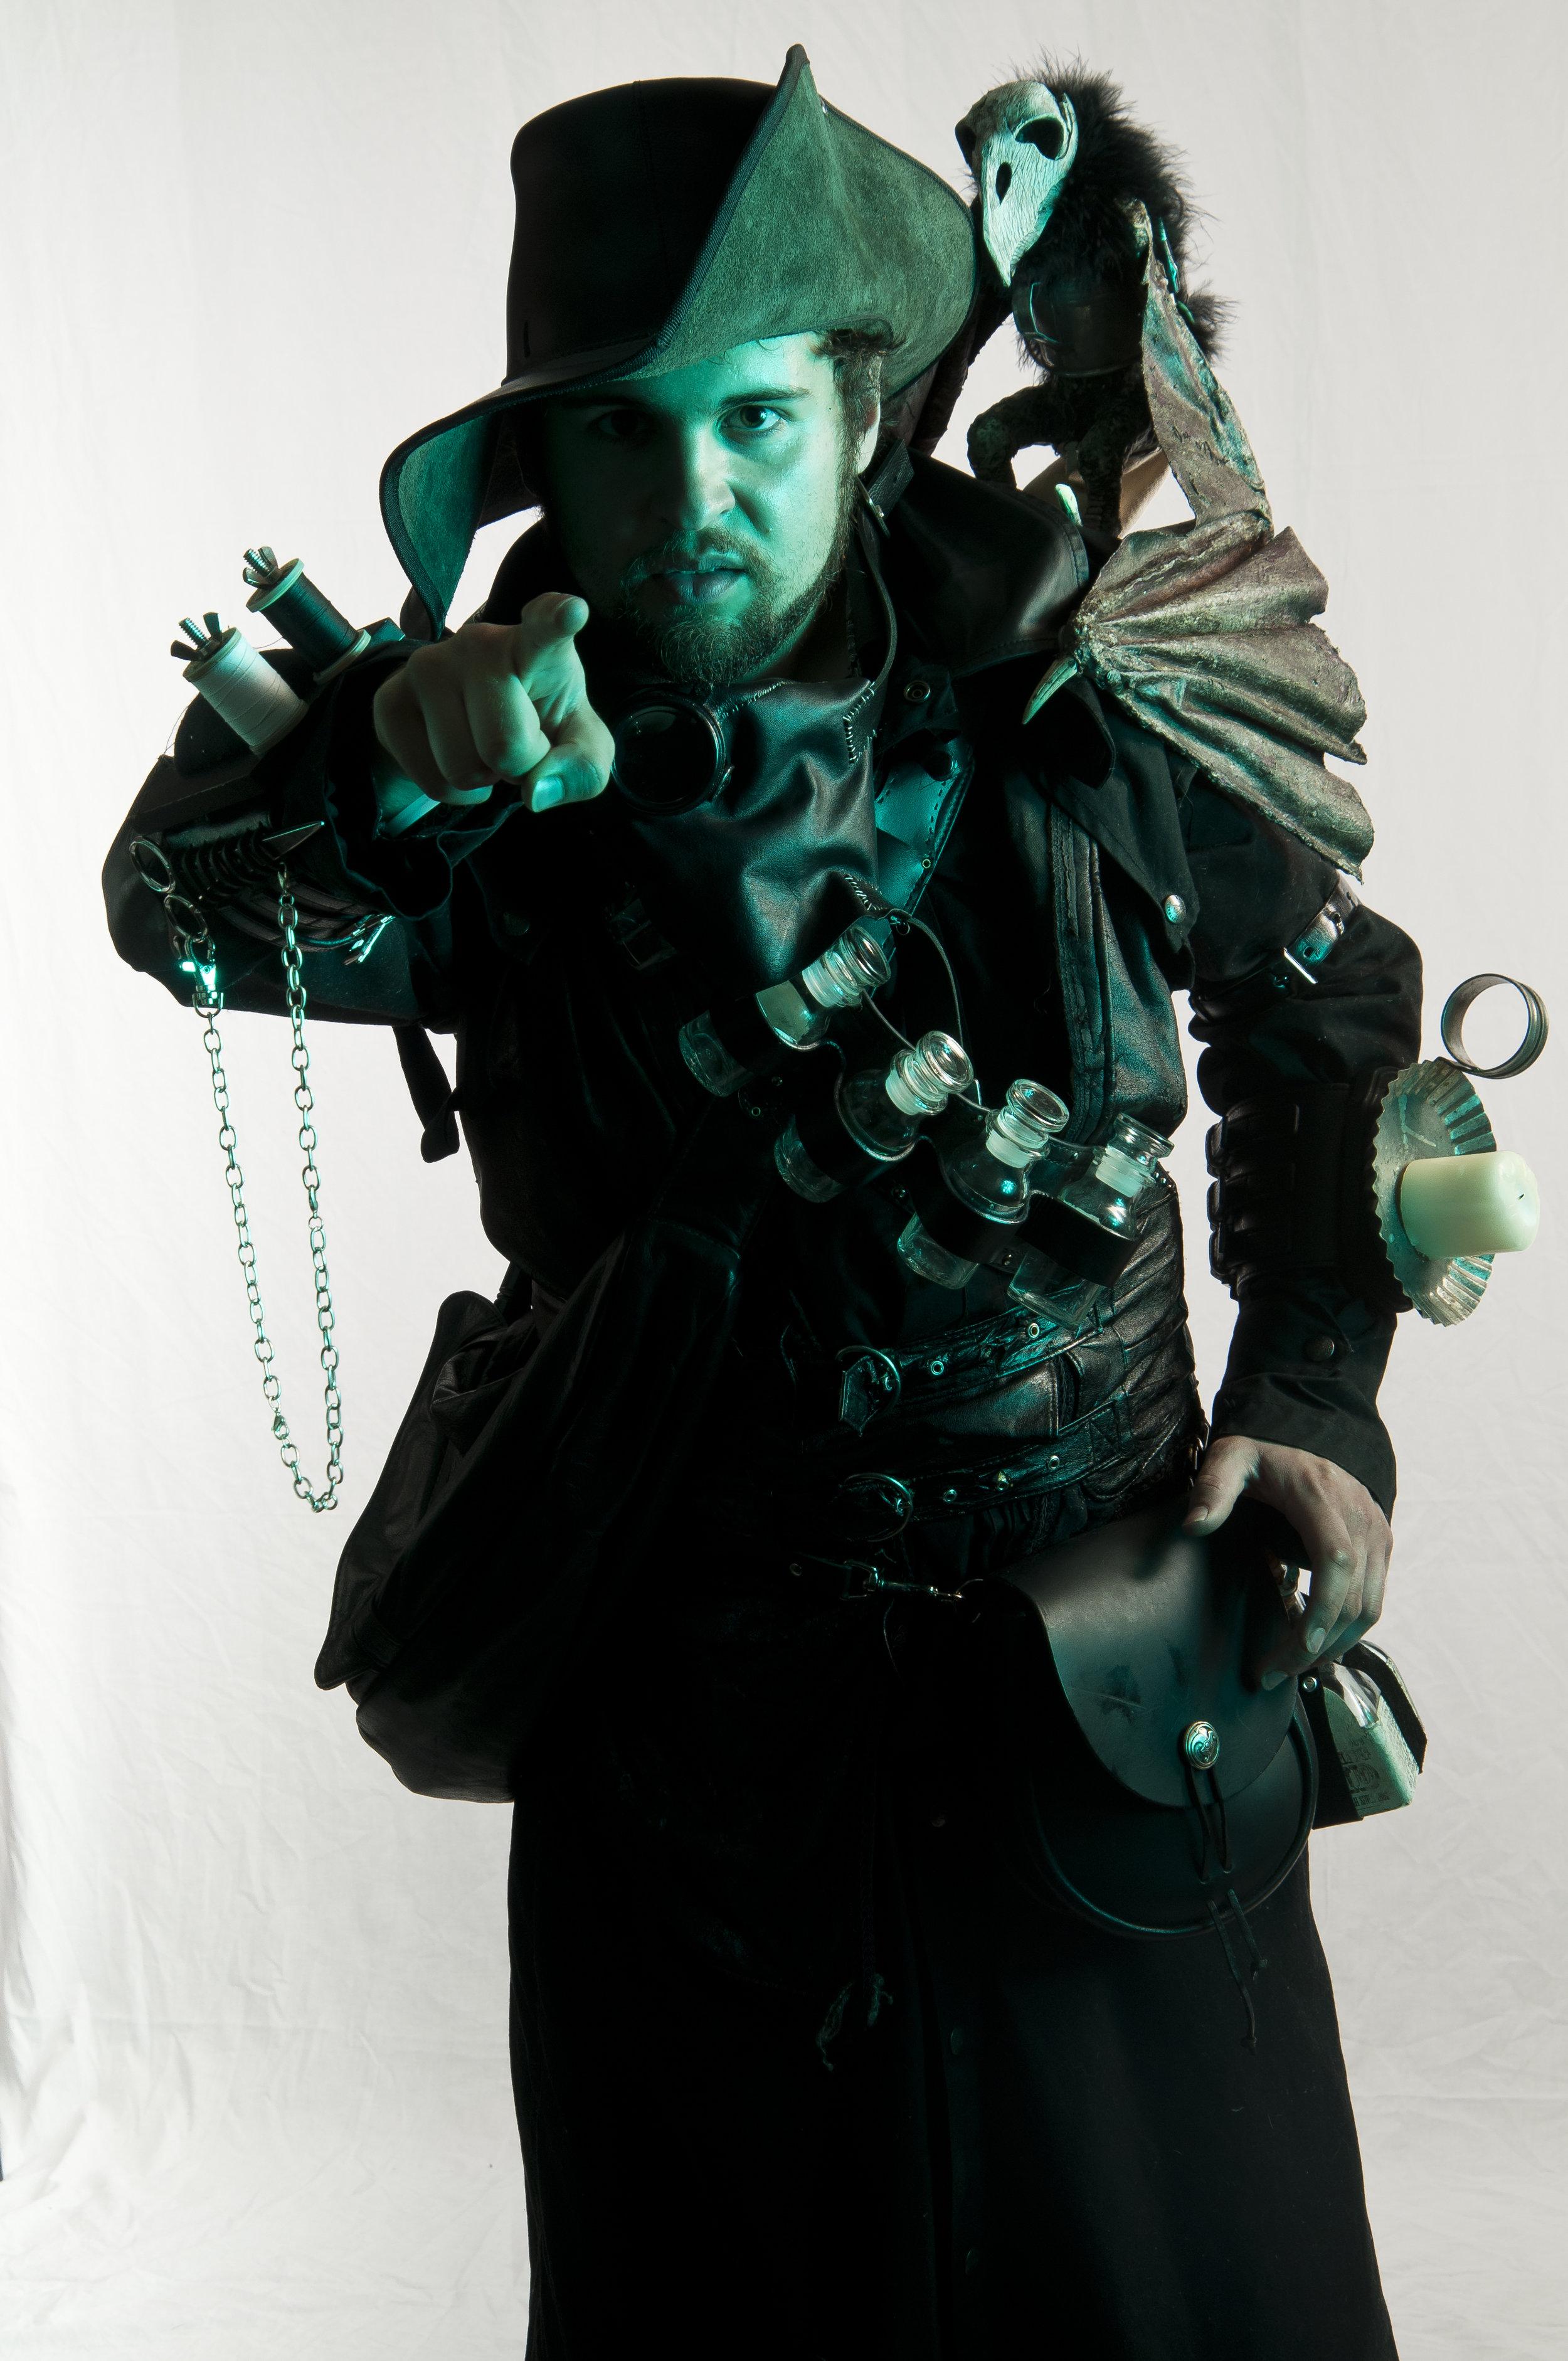 Yorick, the Zombie Familiar, and steampunk Necromancer costume